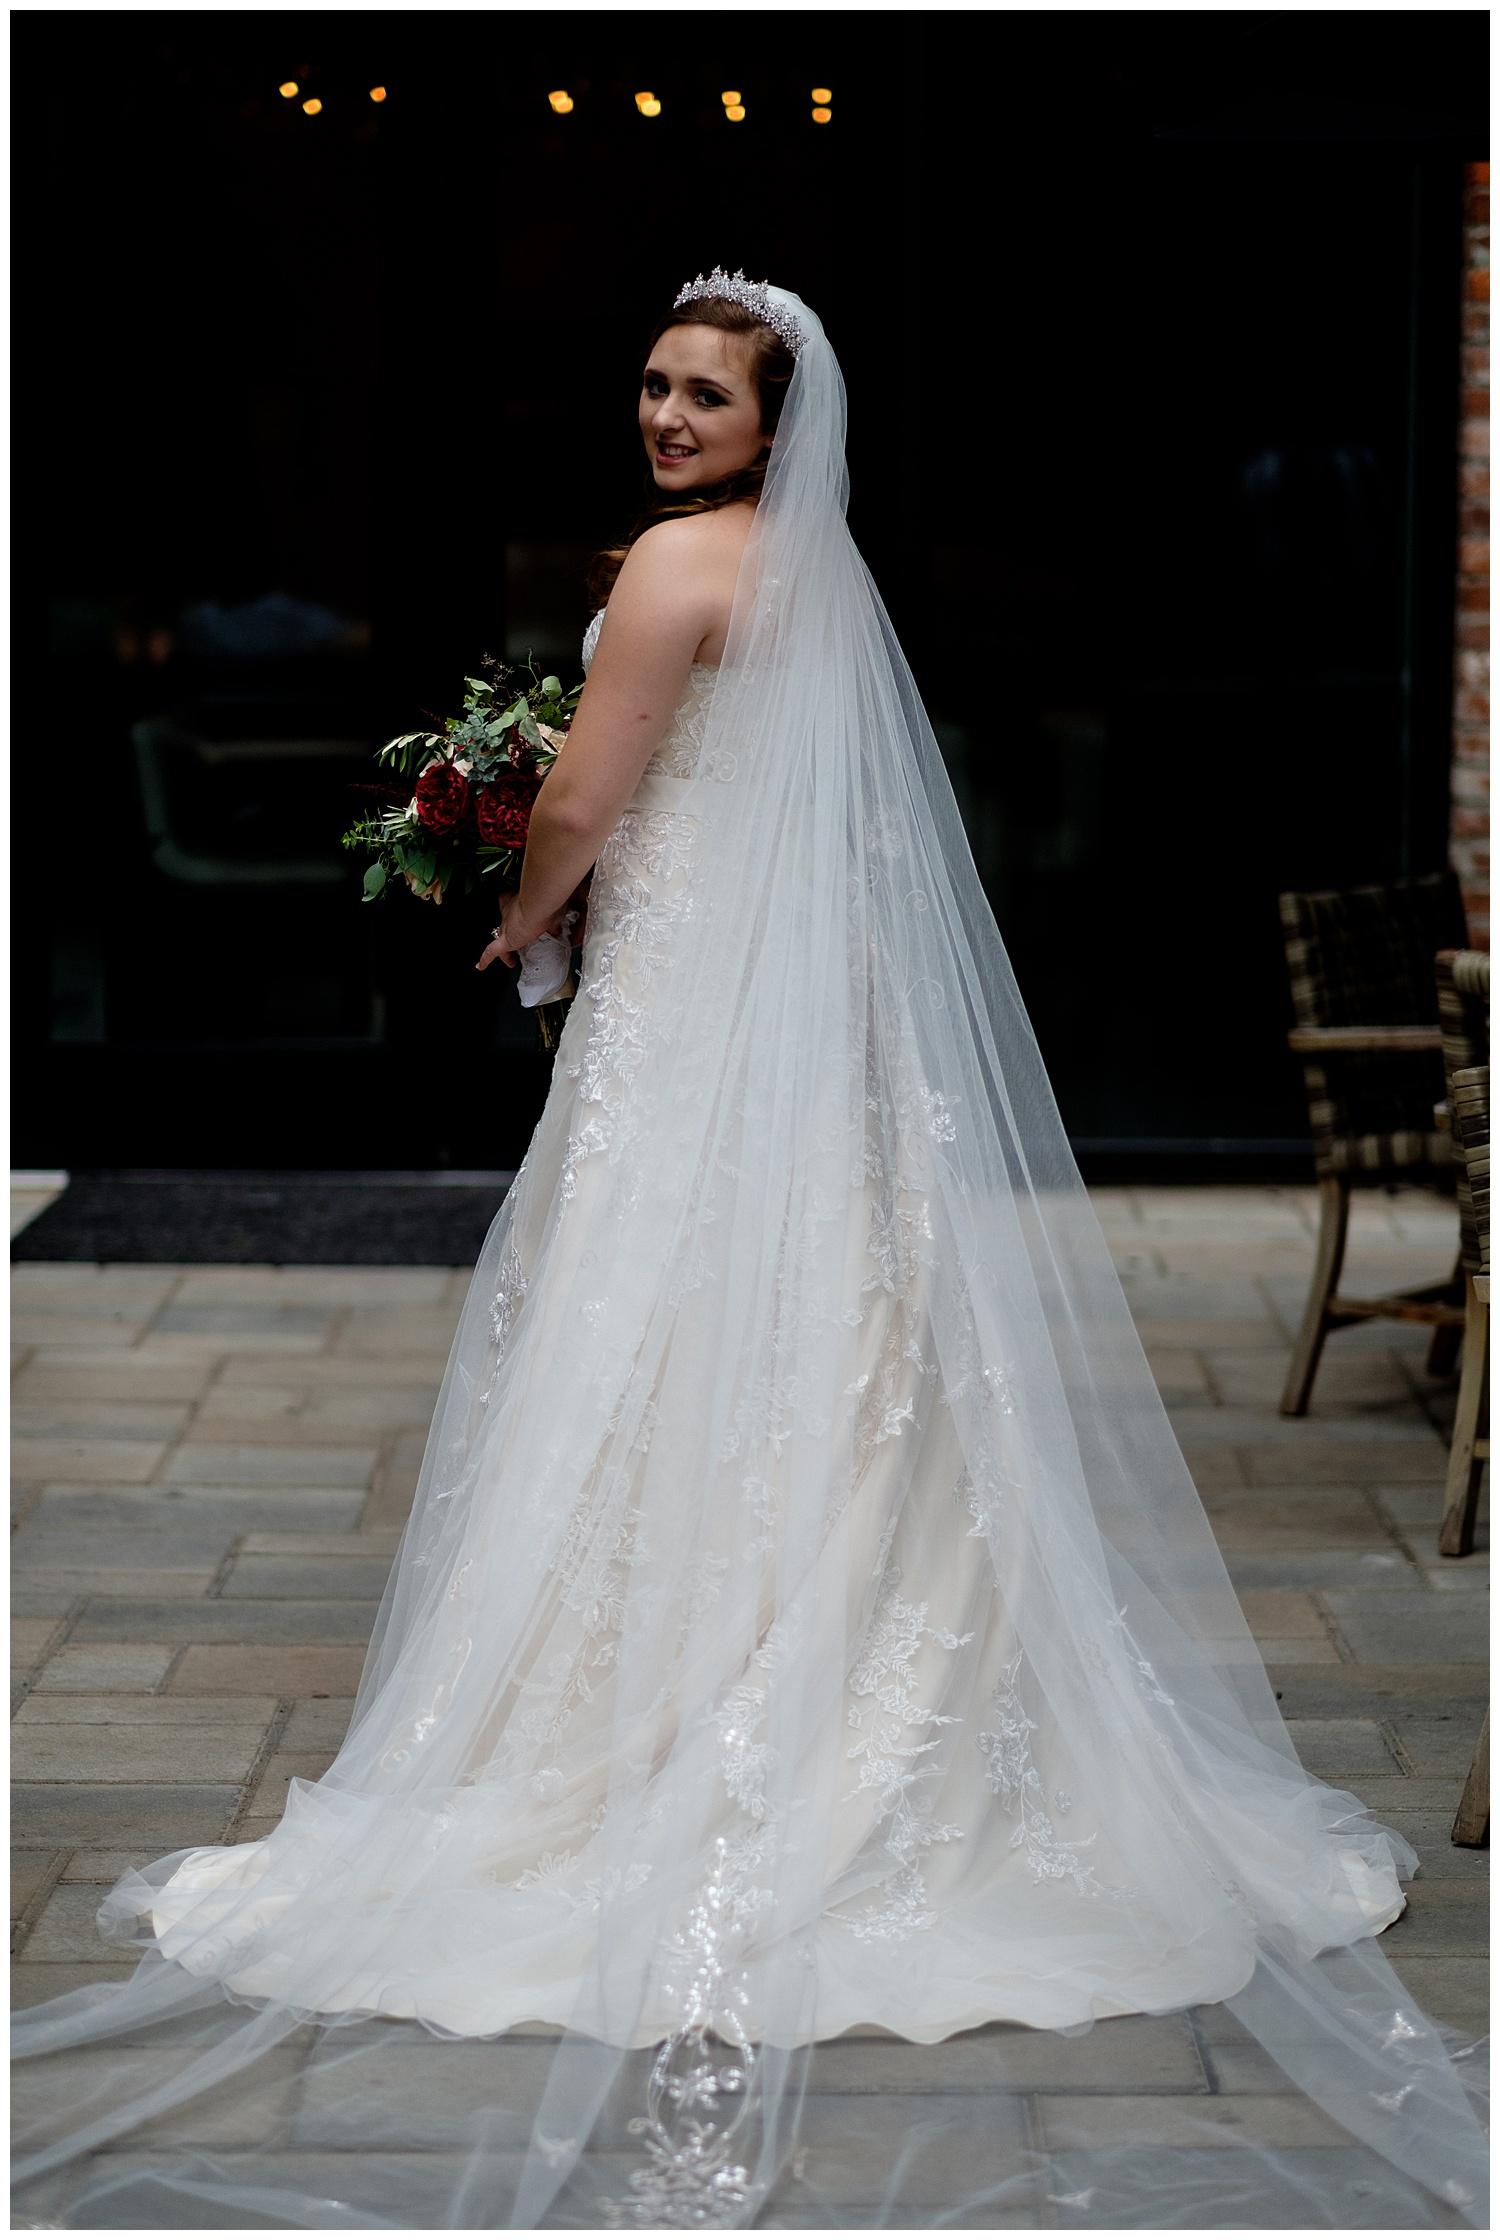 TheSmythCollective-Best-Cincinnati-Wedding-Photographer-Urban-Downtown-Covington-Wedding-22.jpg